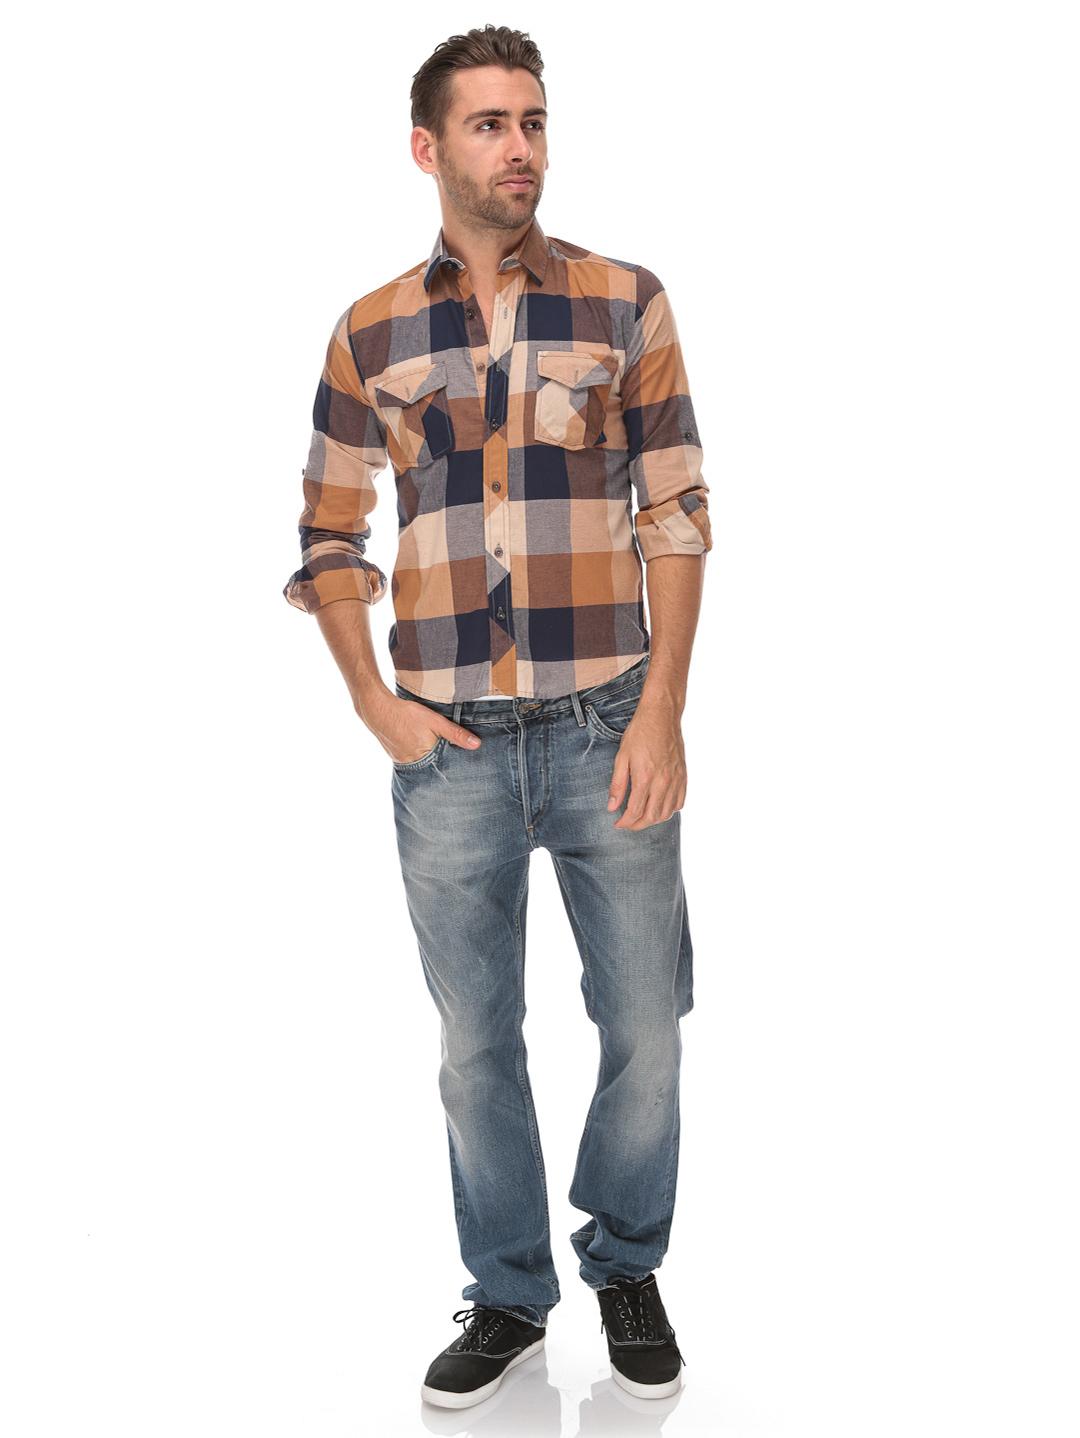 Men 39 s check shirts collection 2013 2014 for Mens fashion dress shirts